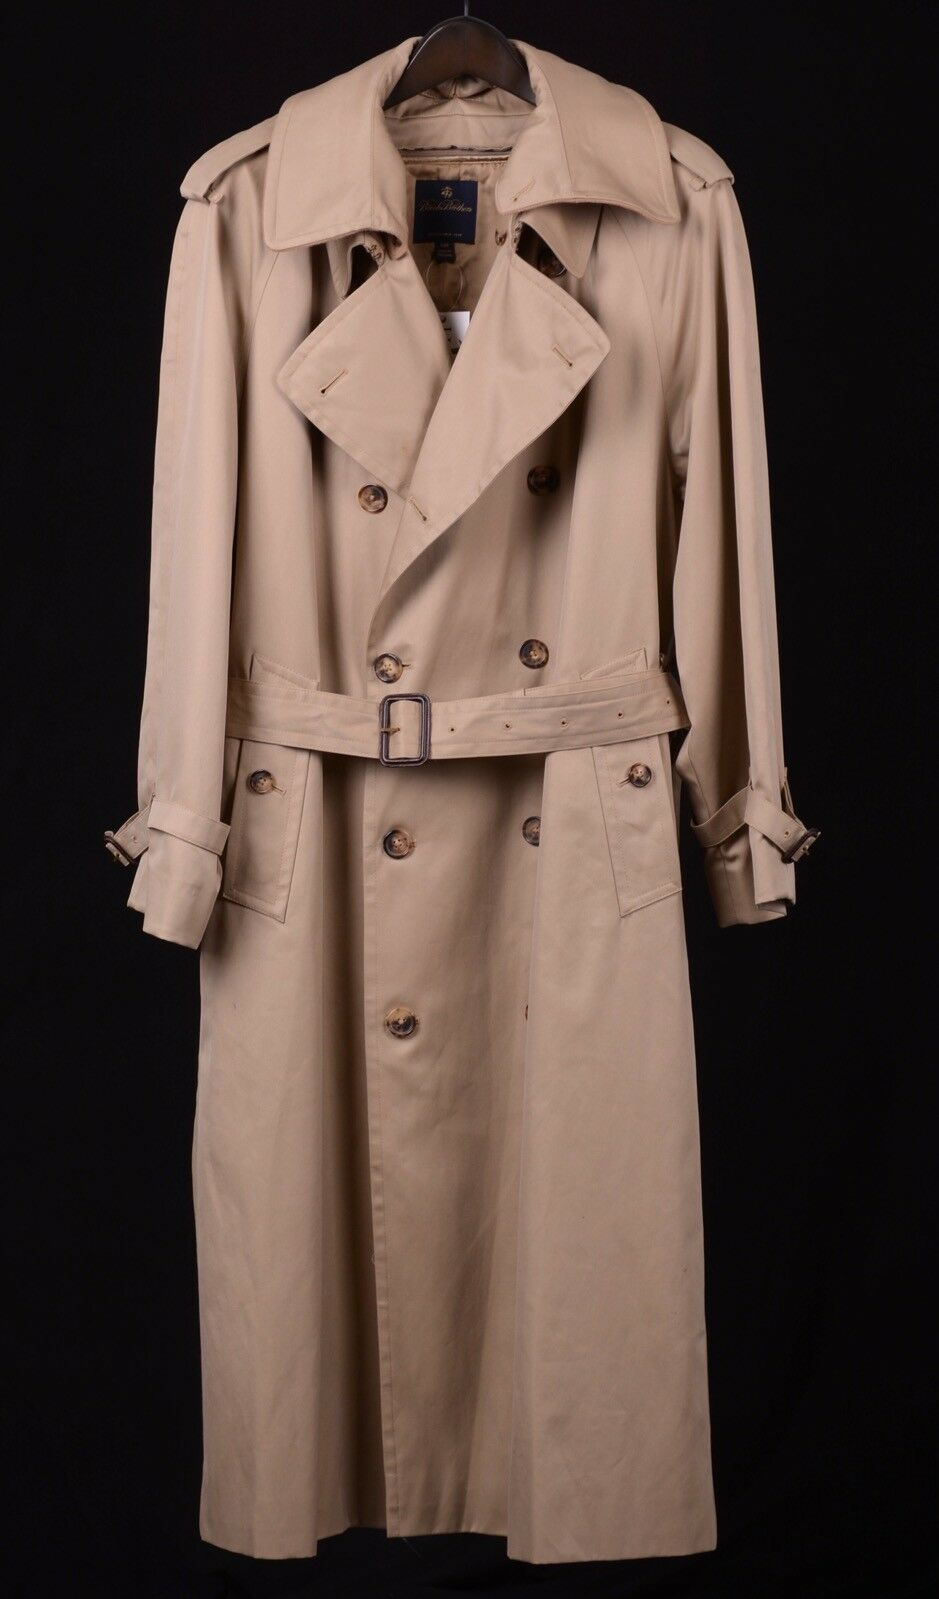 Brooks Brothers Khaki Tan Cotton Twill Cashmere Wool Lined Trench Rain Coat 44 R